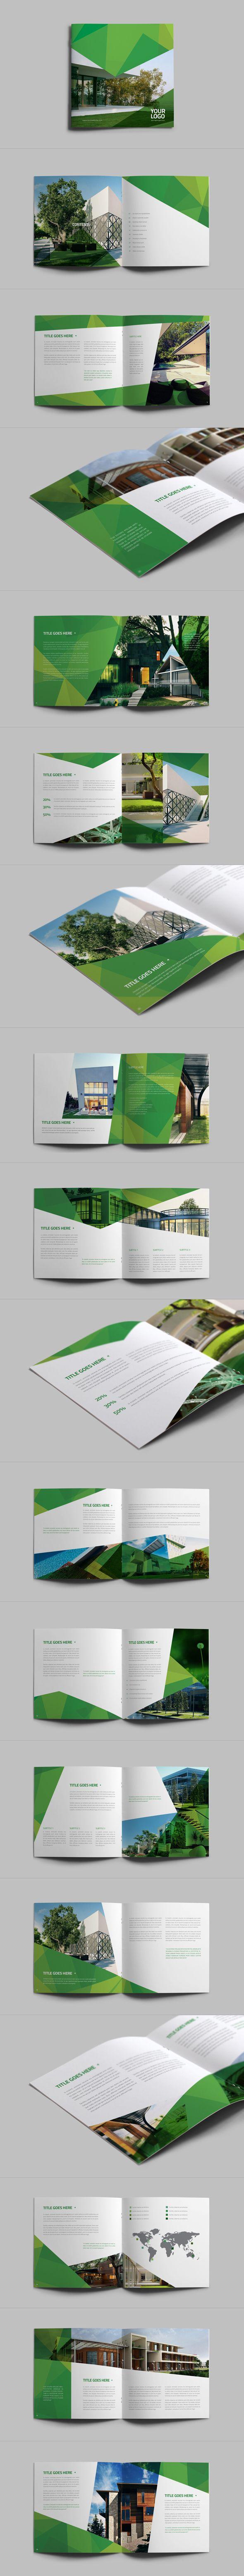 Abstract Ecologic Brochure.                              …                                                                                                                                                                                 Más